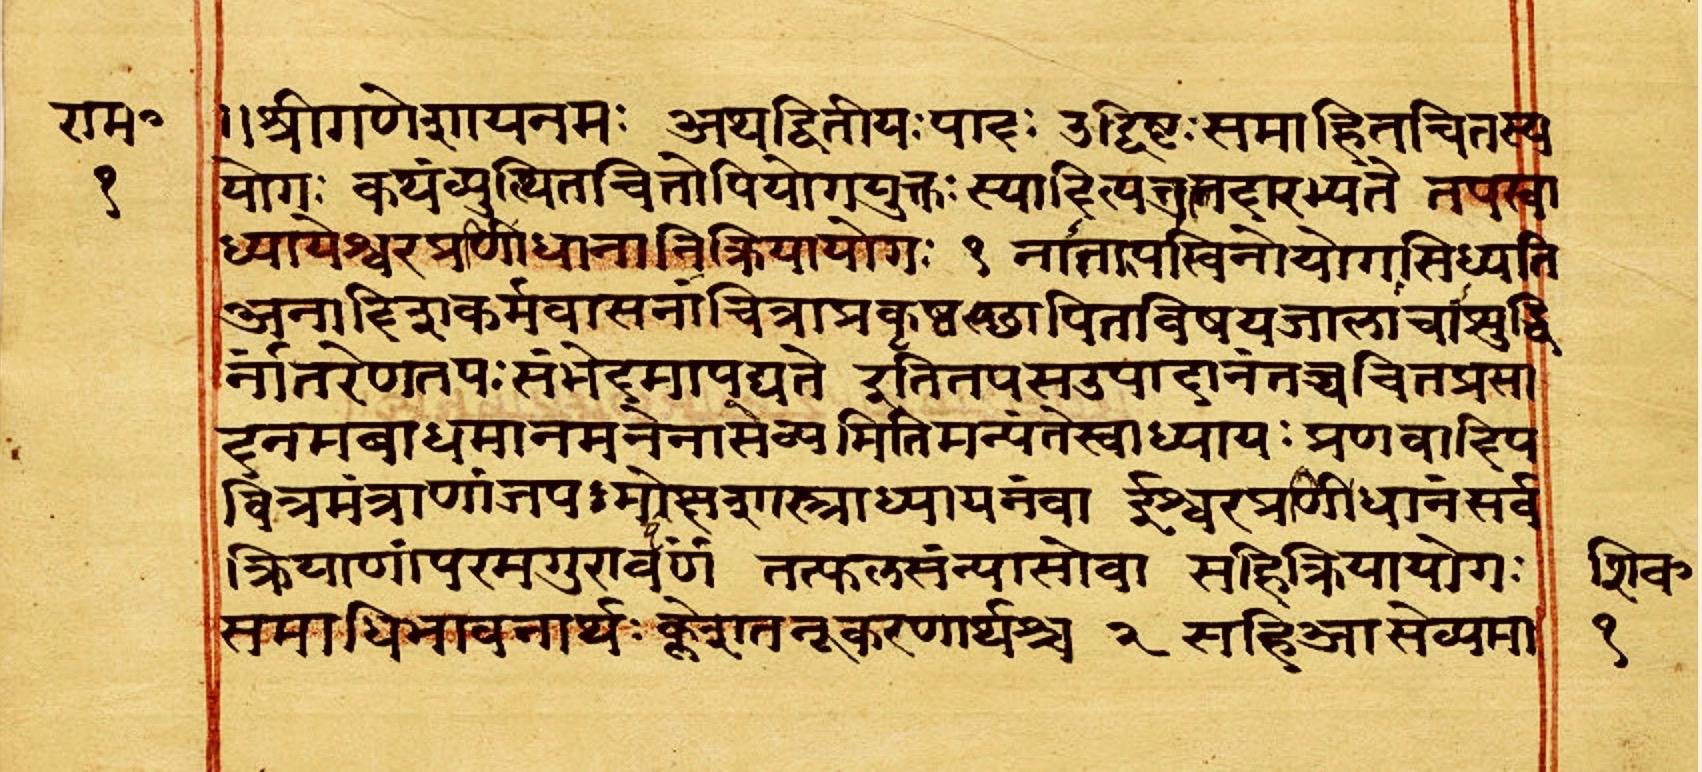 File Yogasutra With Patanjali S Bhasya Sanskrit Devanagari Script Sample Page F1v Jpg Wikimedia Commons